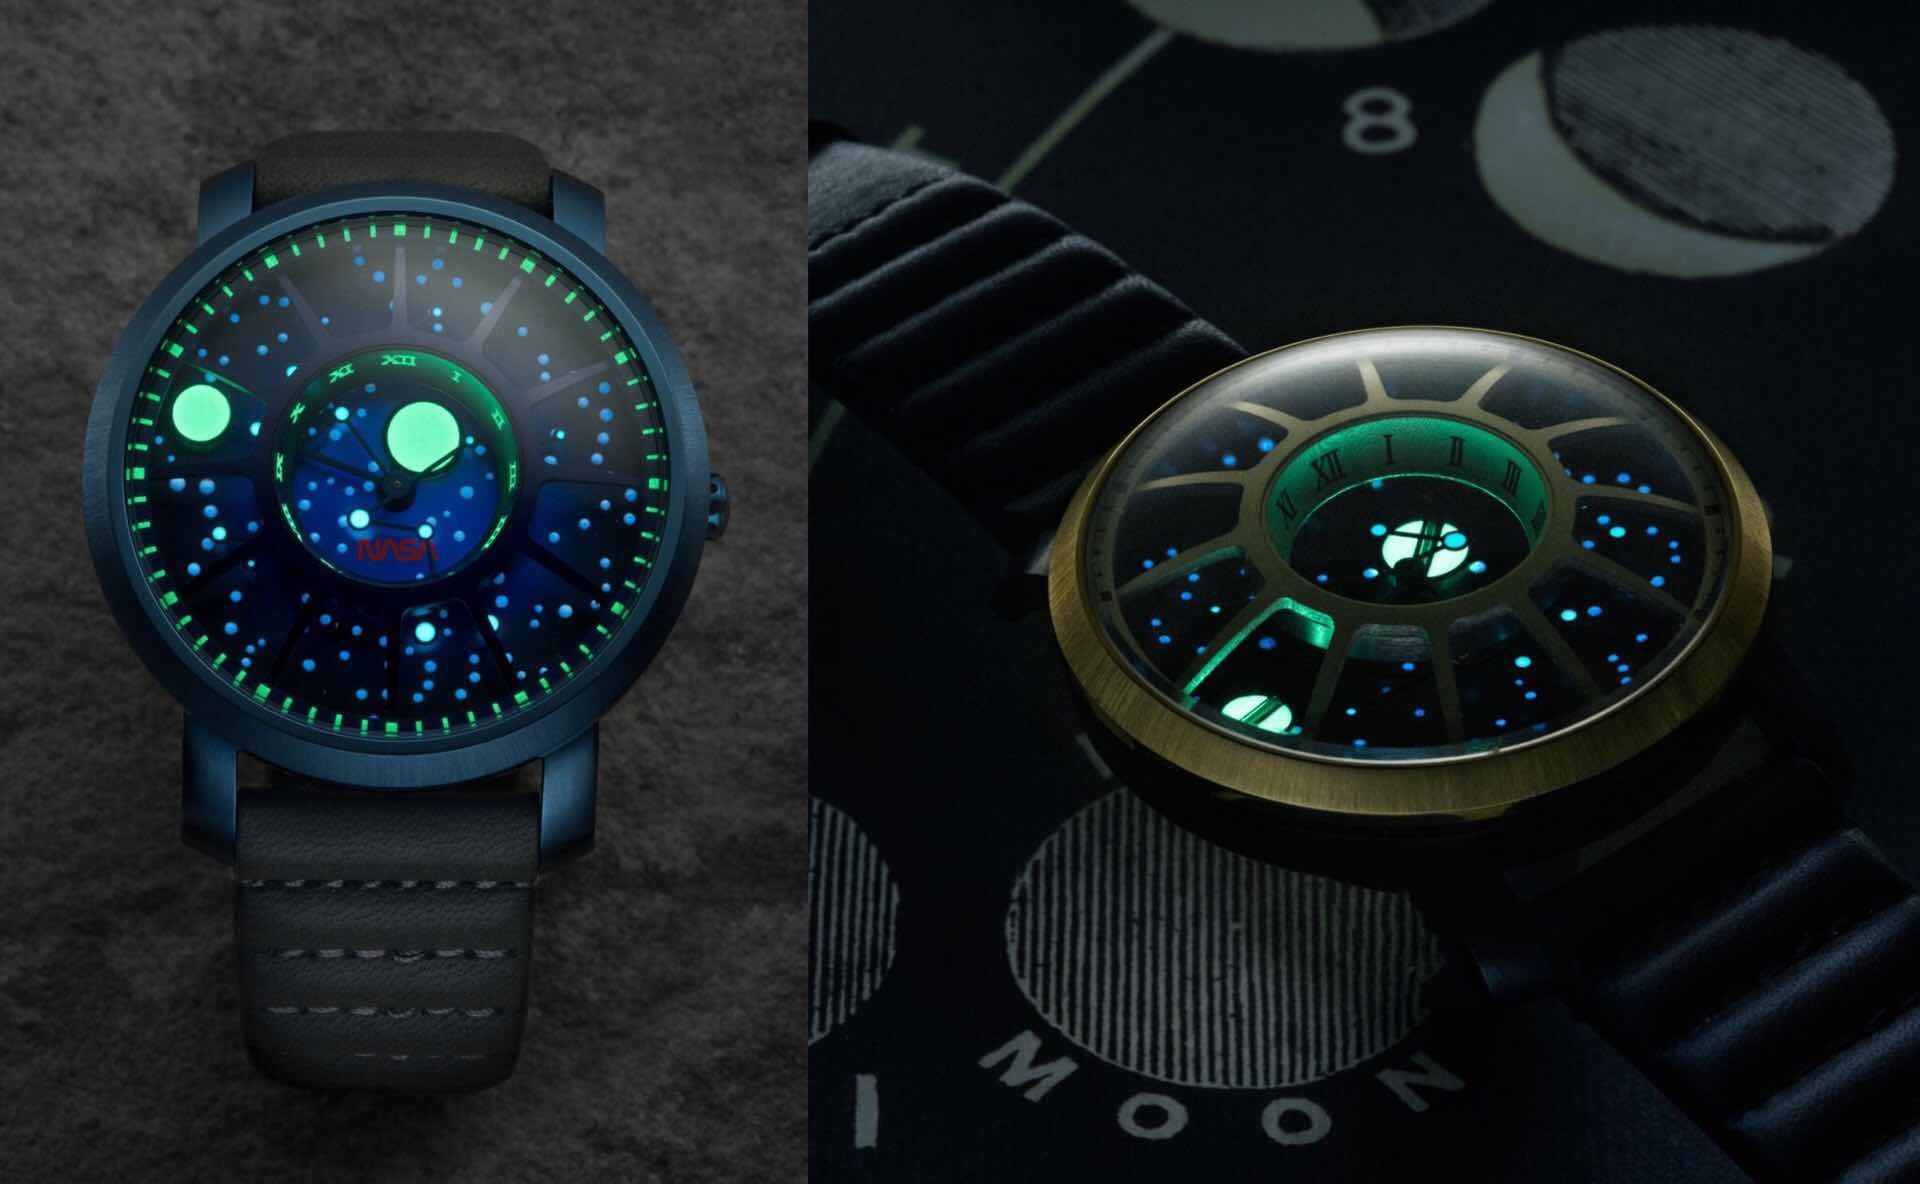 xeric-trappist-1-nasa-edition-automatic-watches-kickstarter-3